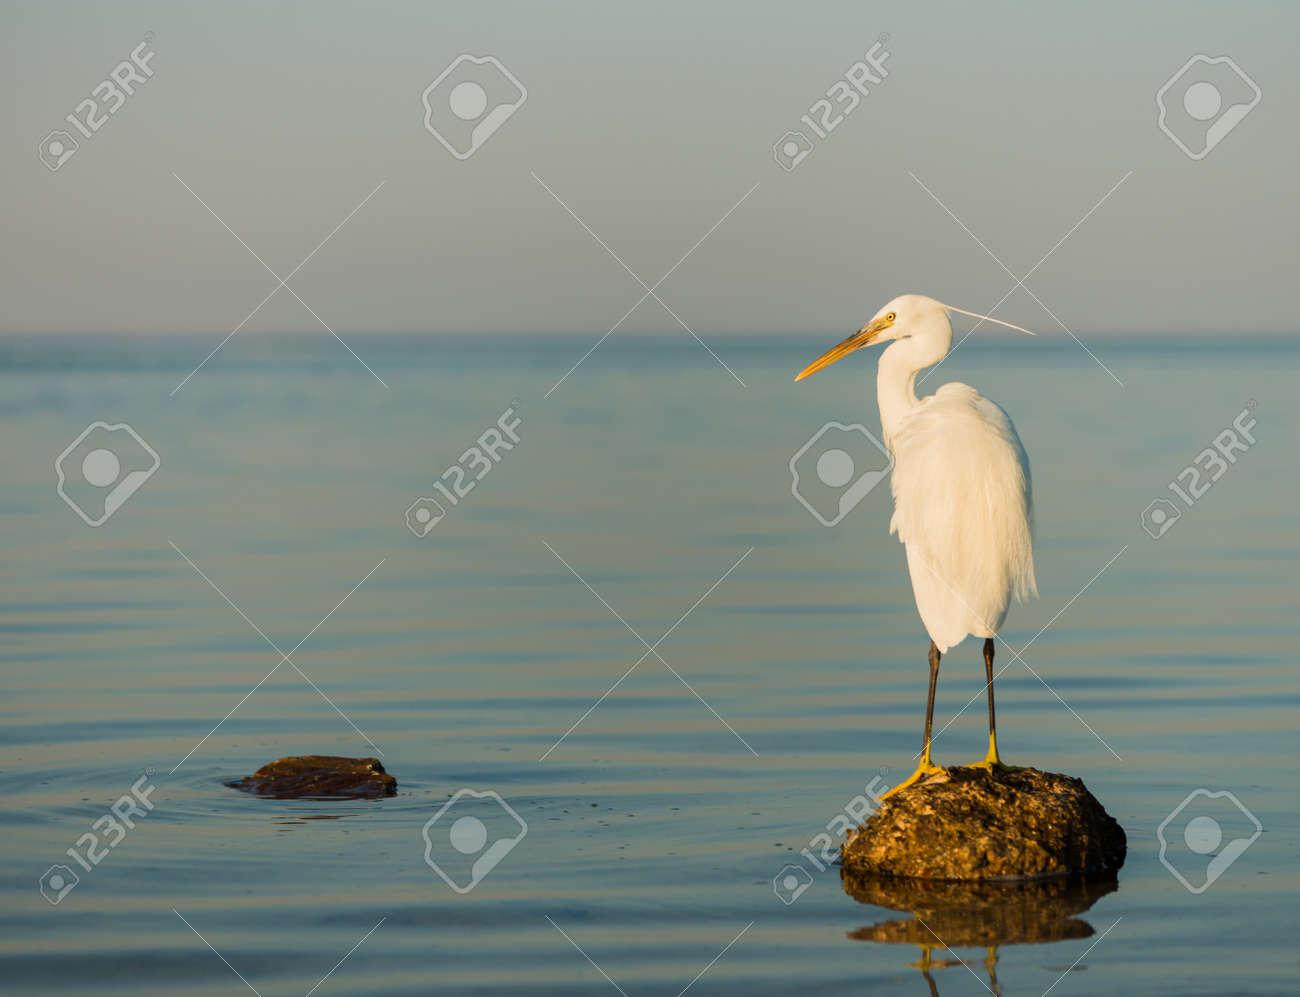 wild white brird on a stone at seascape sunset - 127951885